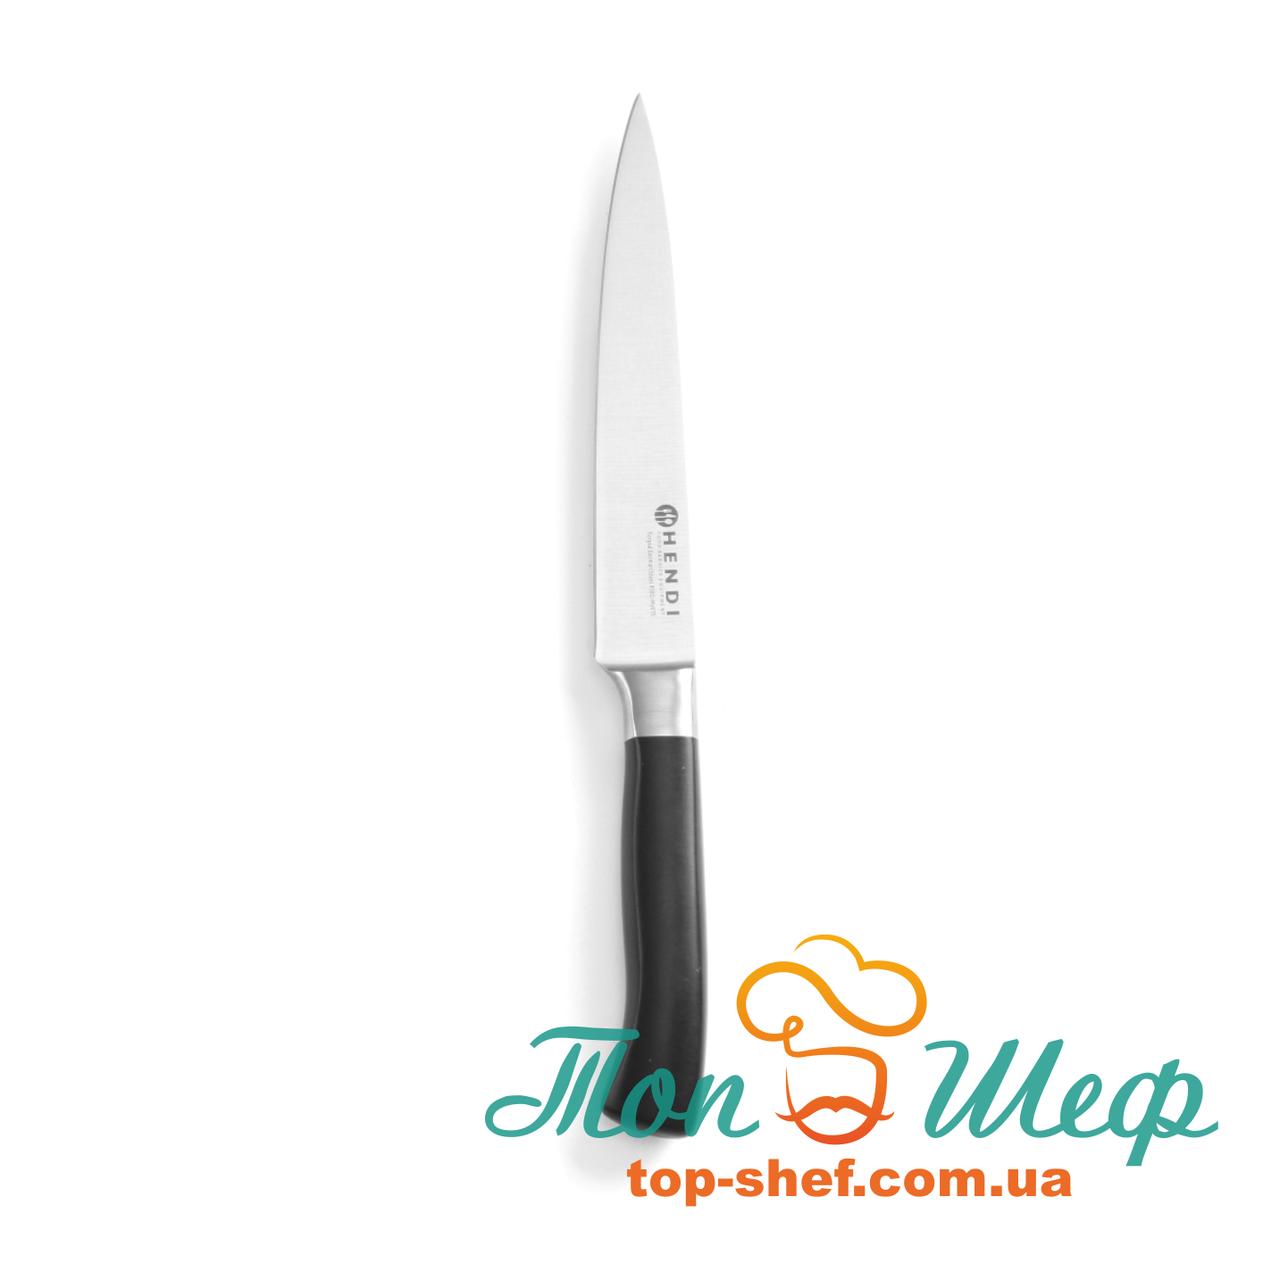 Нож поварской Hendi 844250